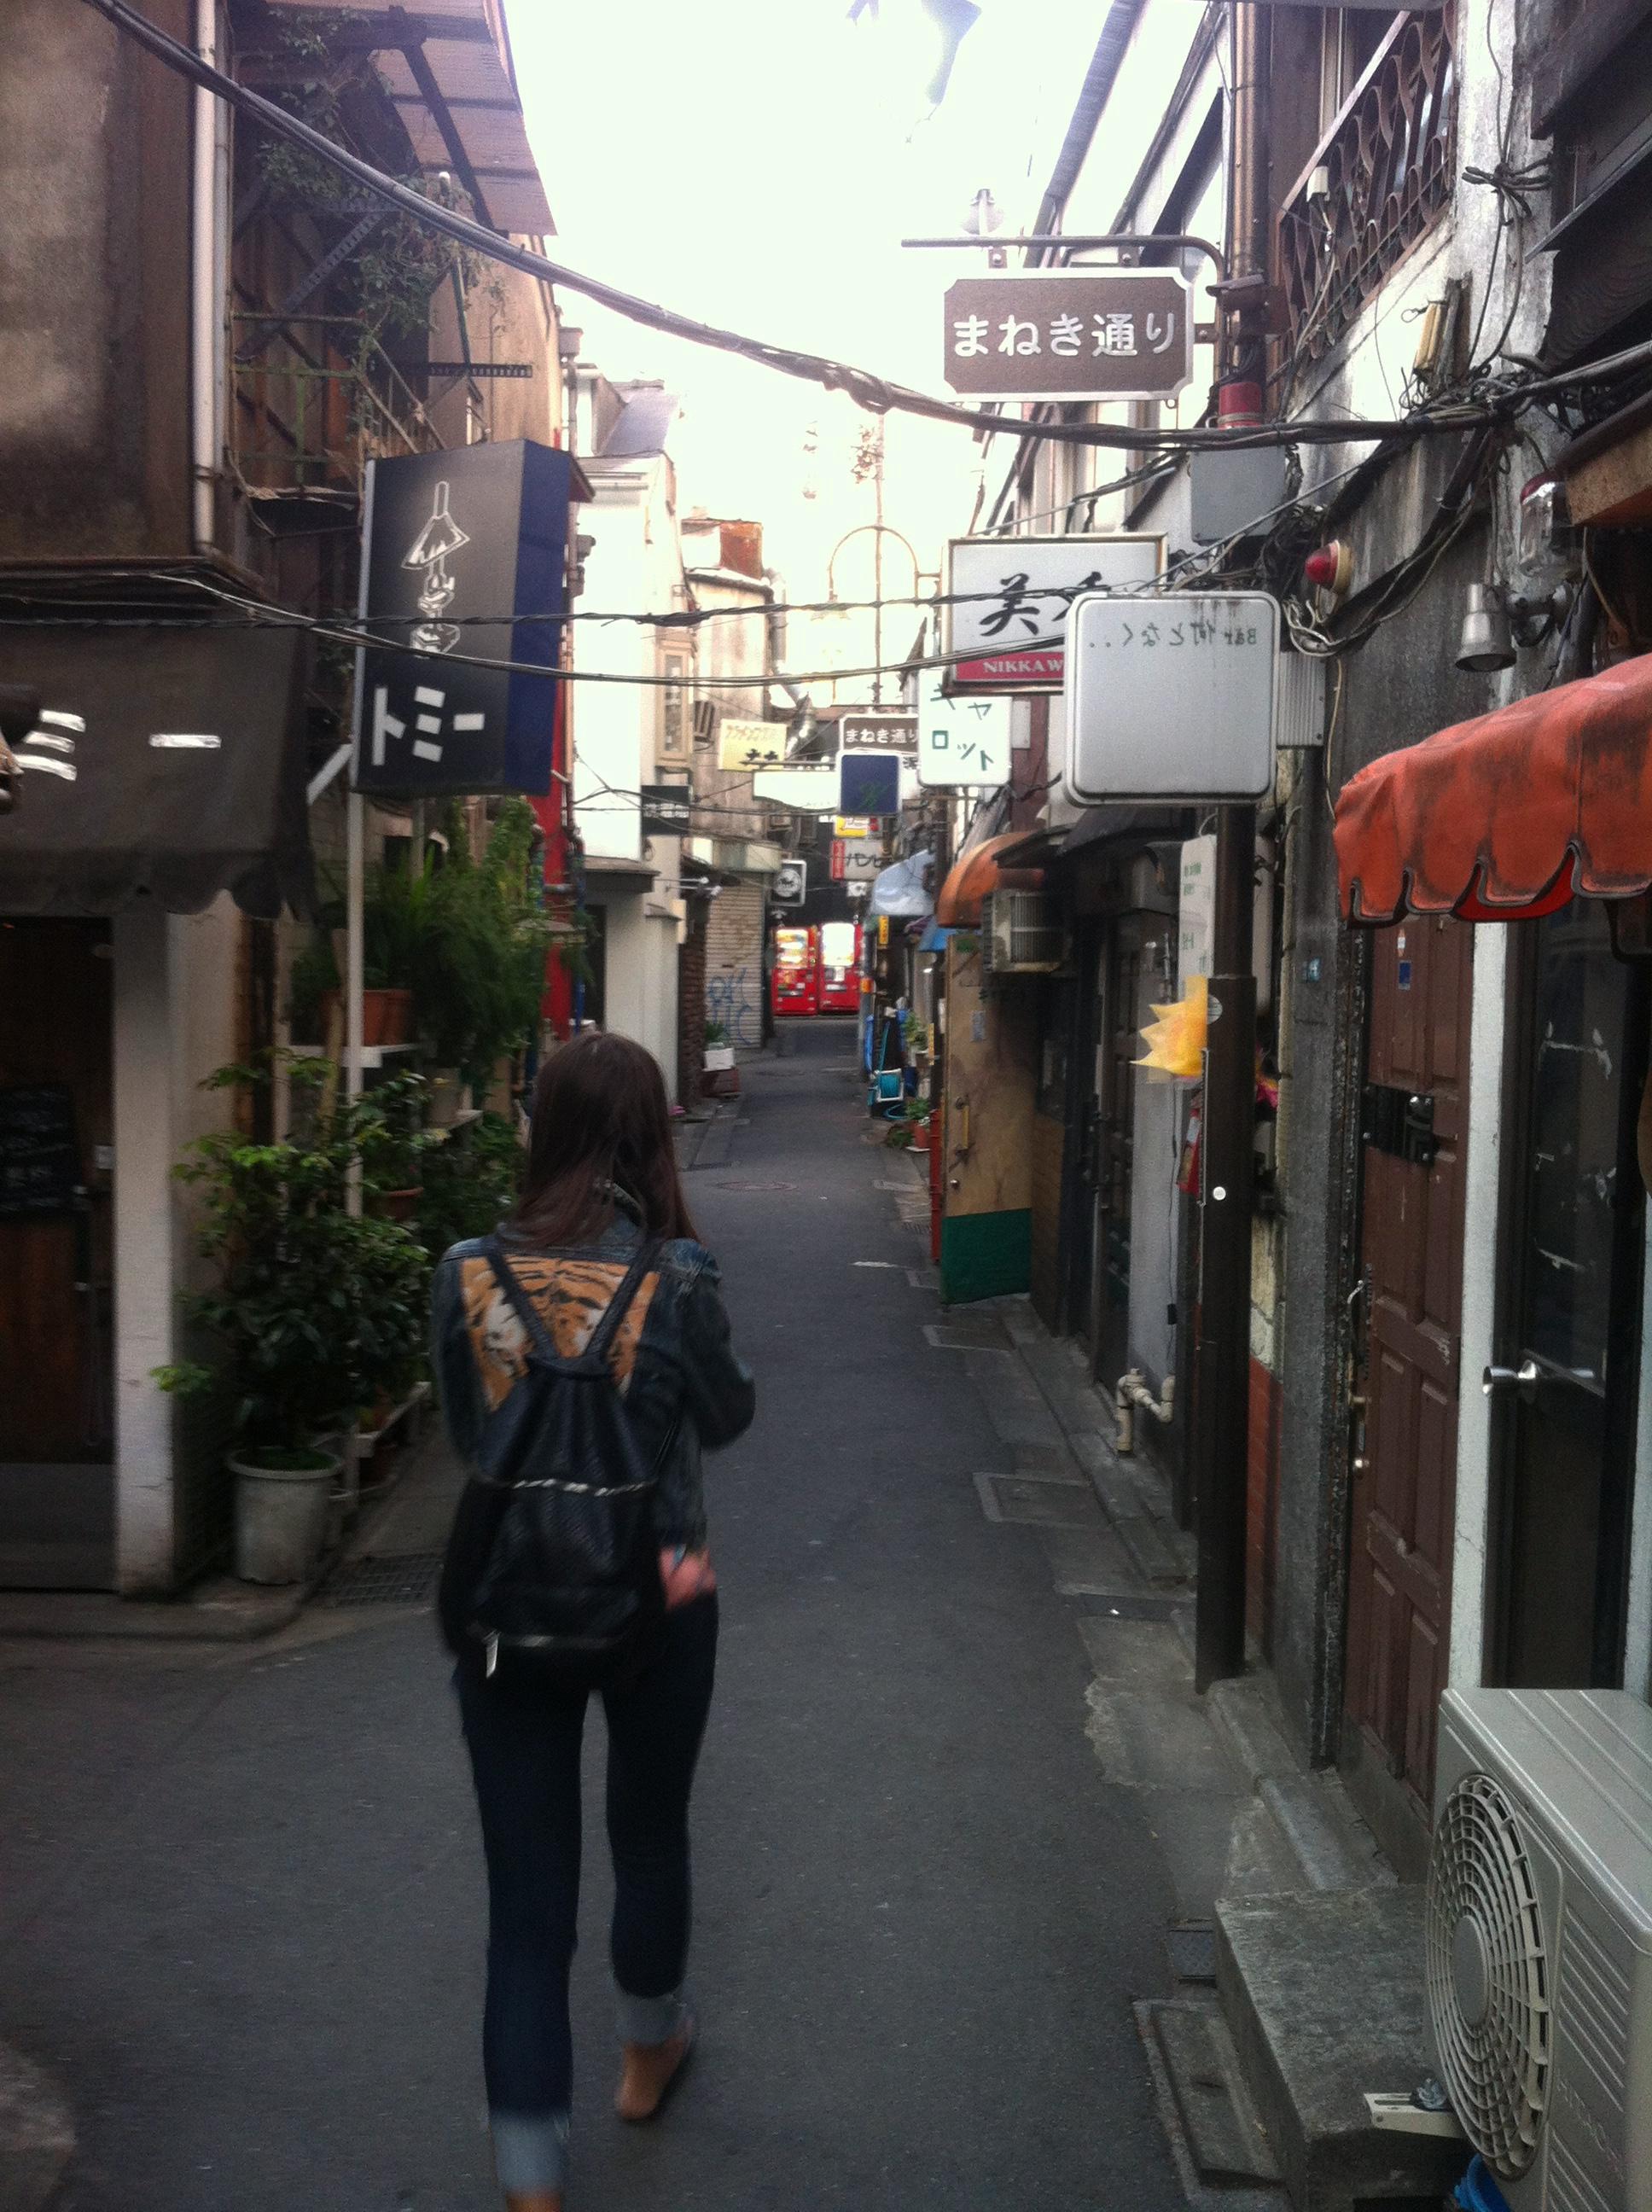 Japan-2014-GoldenGui.jpg